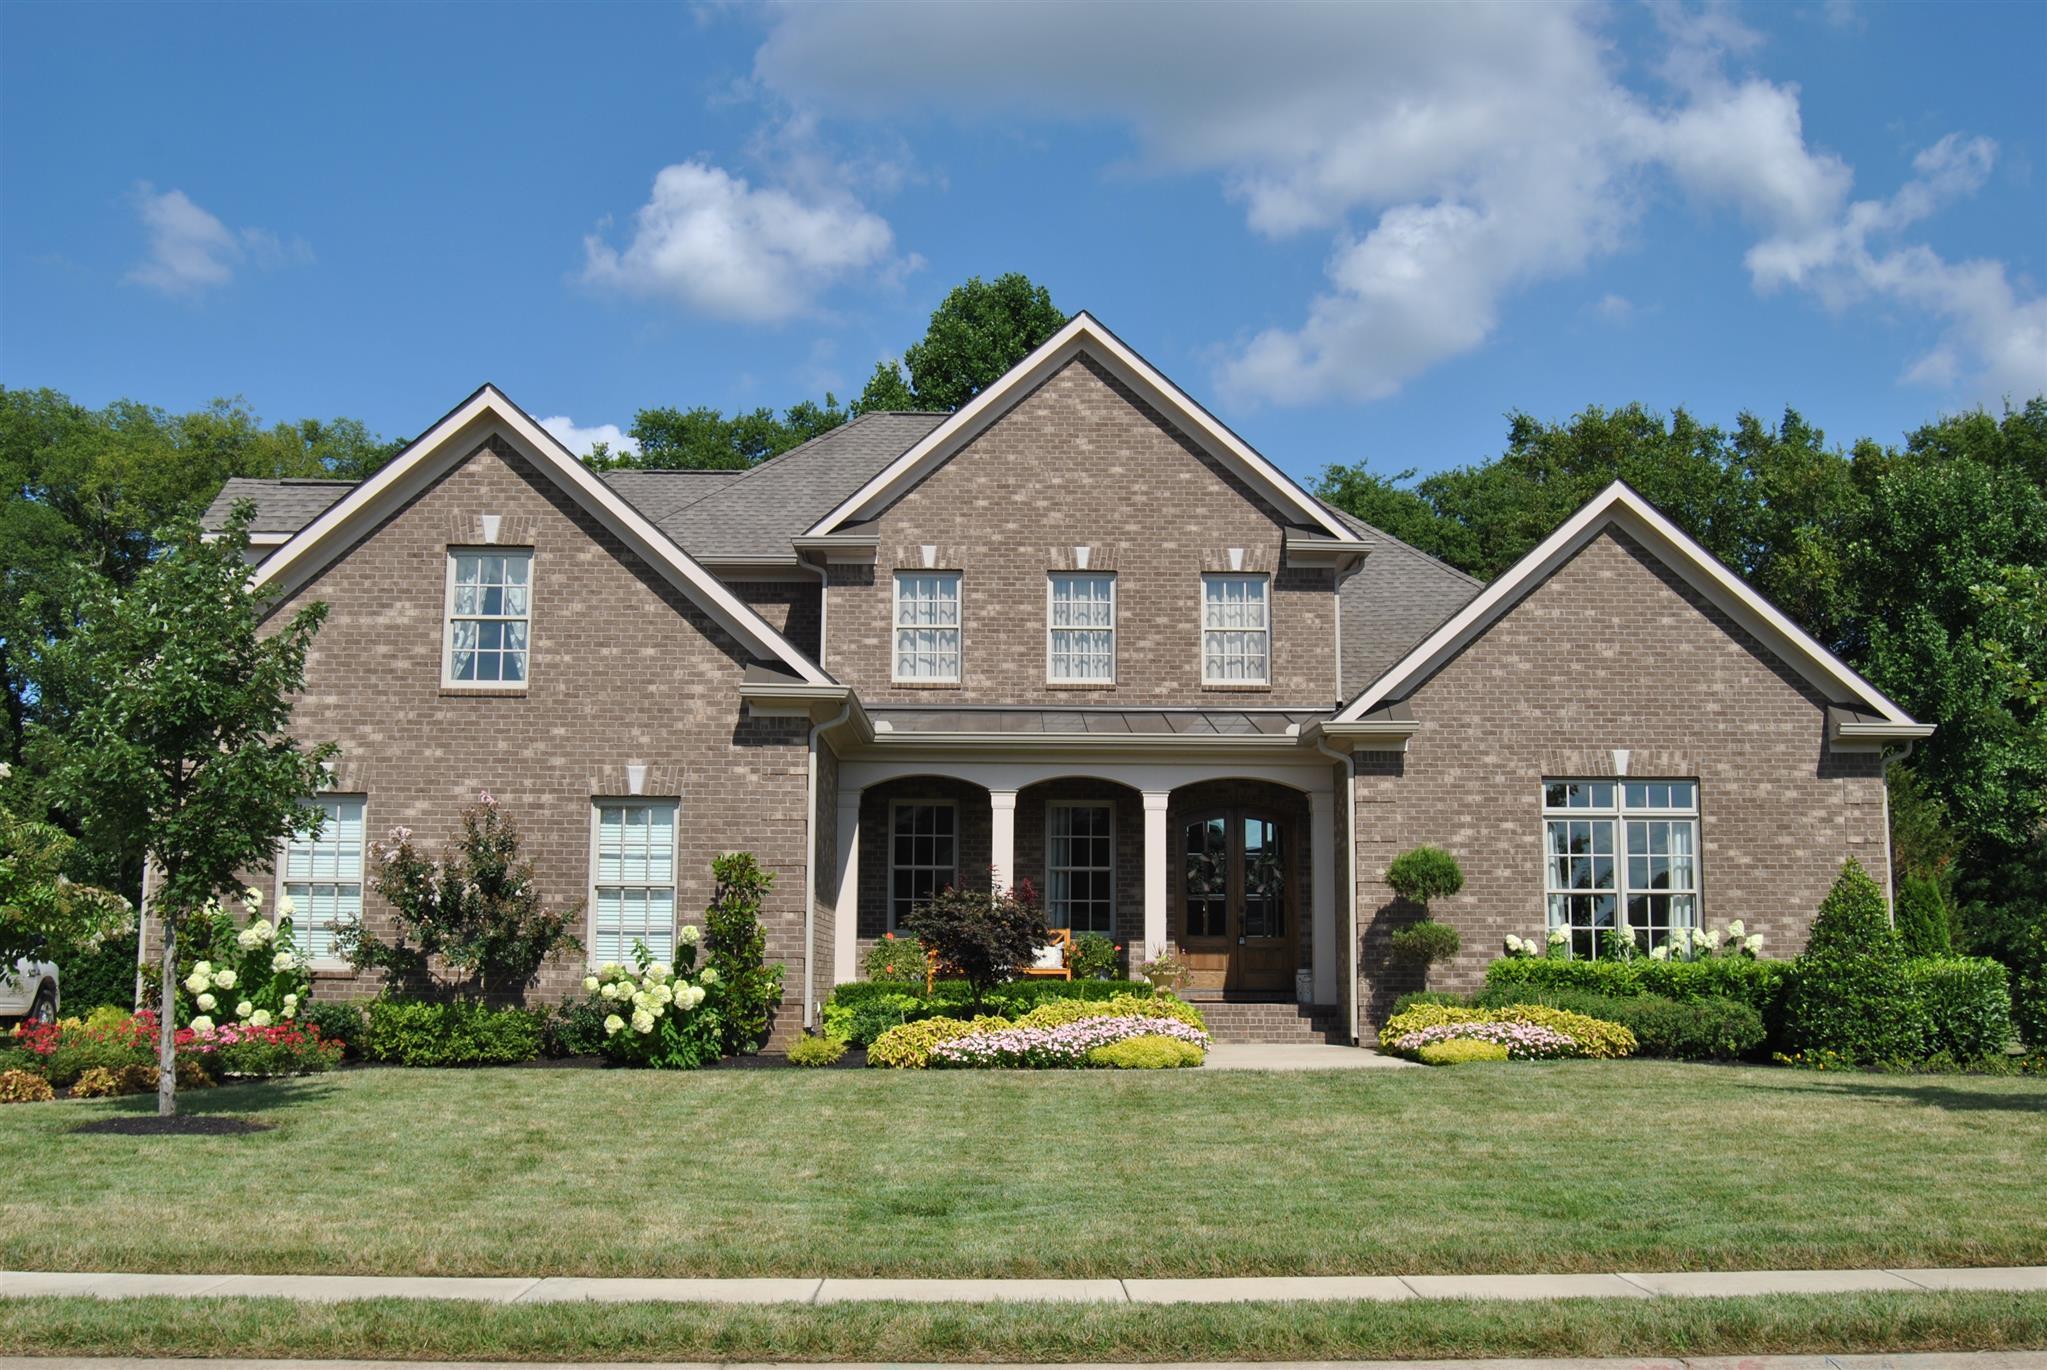 2834 Cherry Blossom Ln Murfreesboro, TN 37129